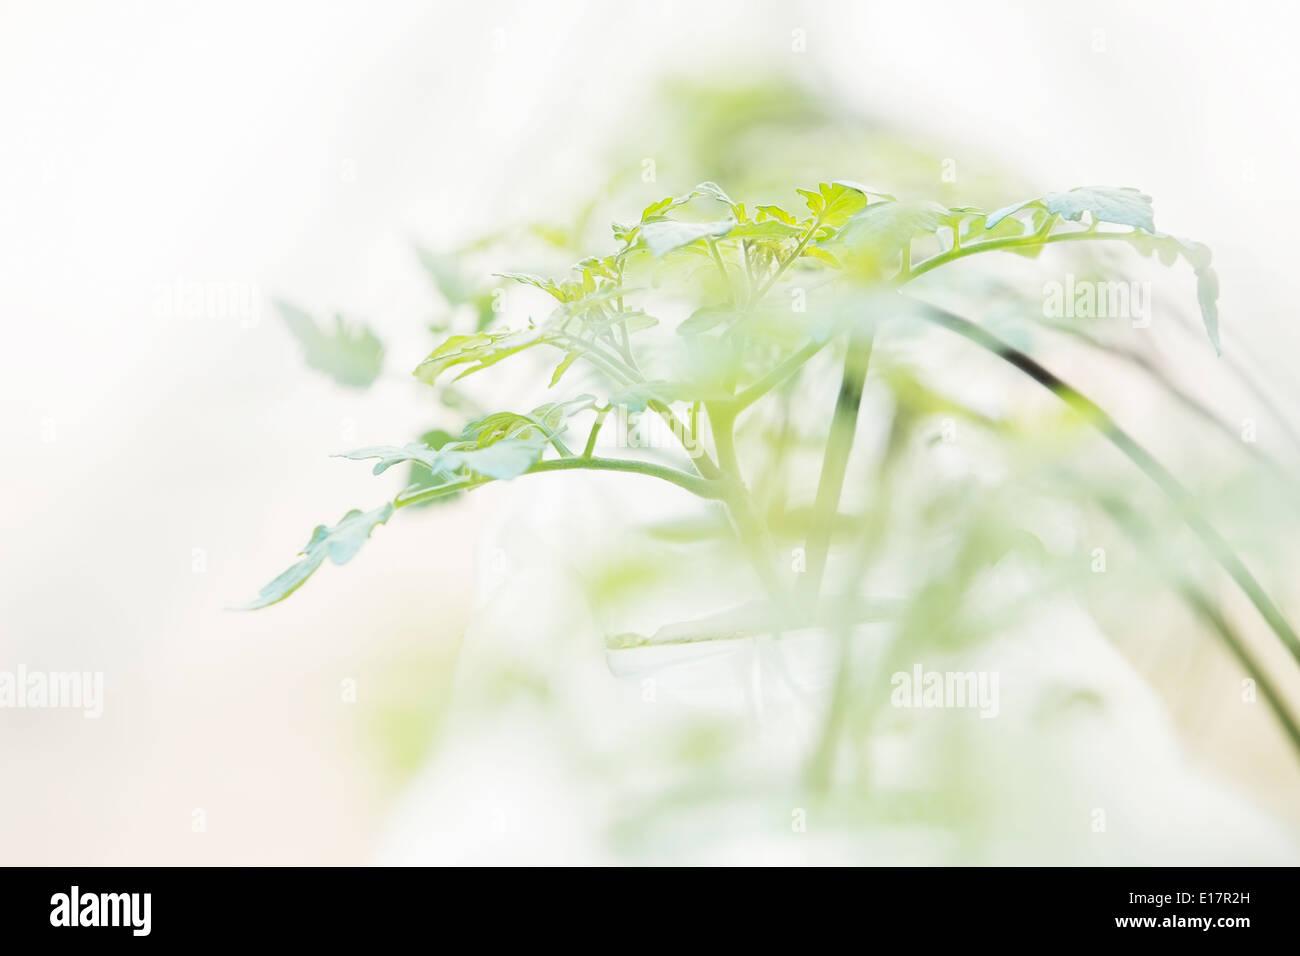 Close up of plant sapling - Stock Image